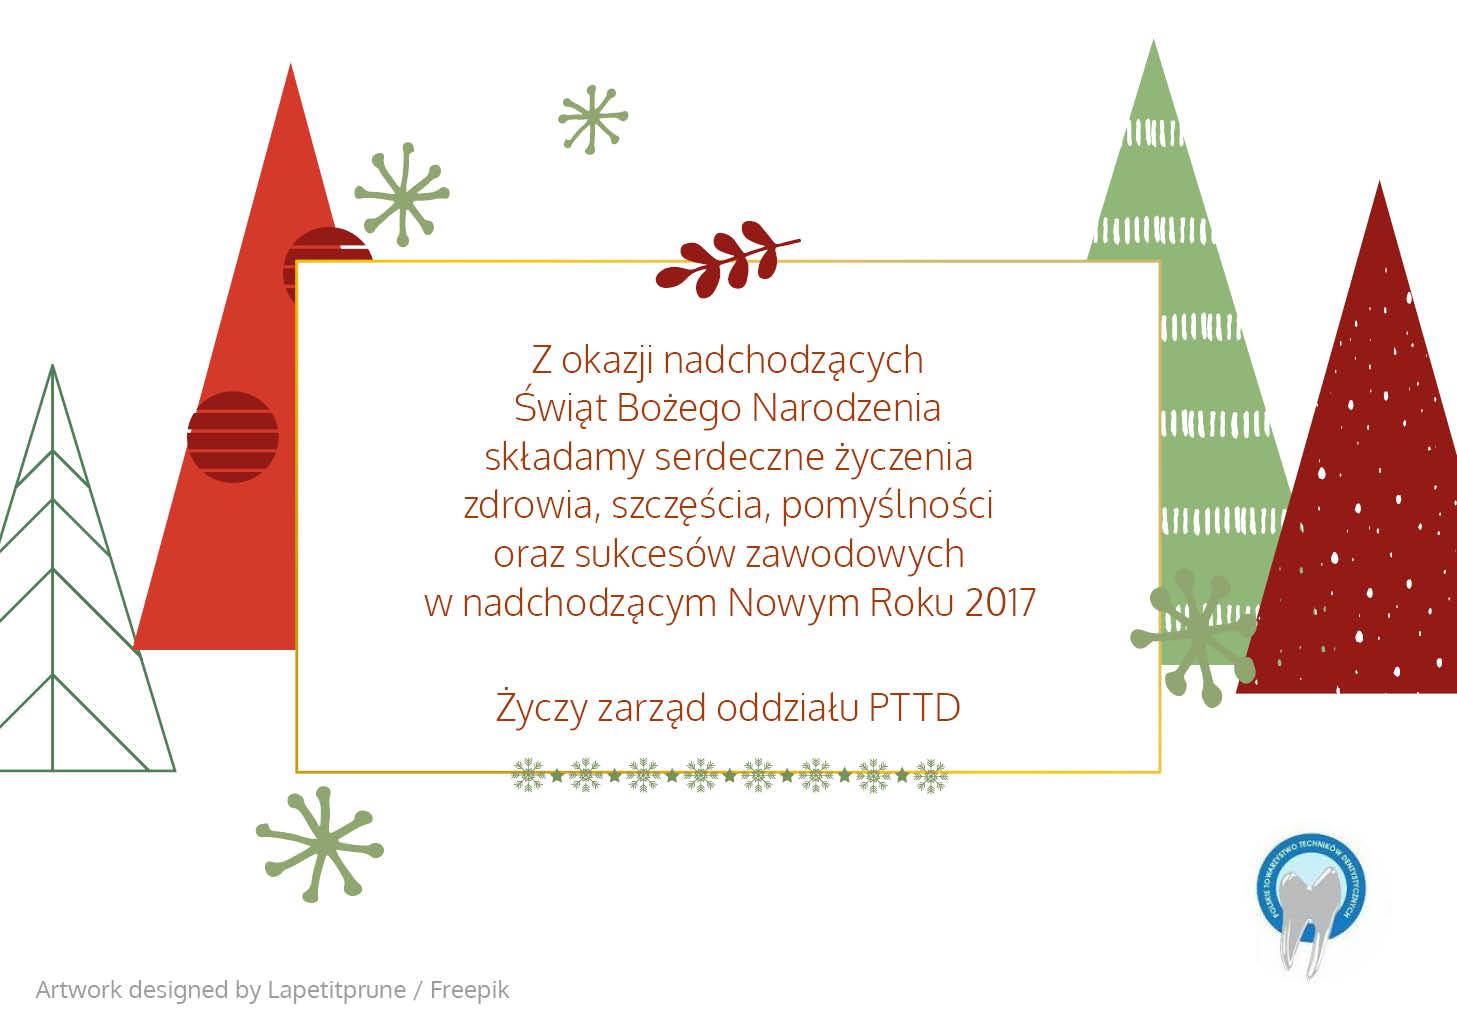 pttd-zaproszenia-boze-narodzenie-2016-v022-1